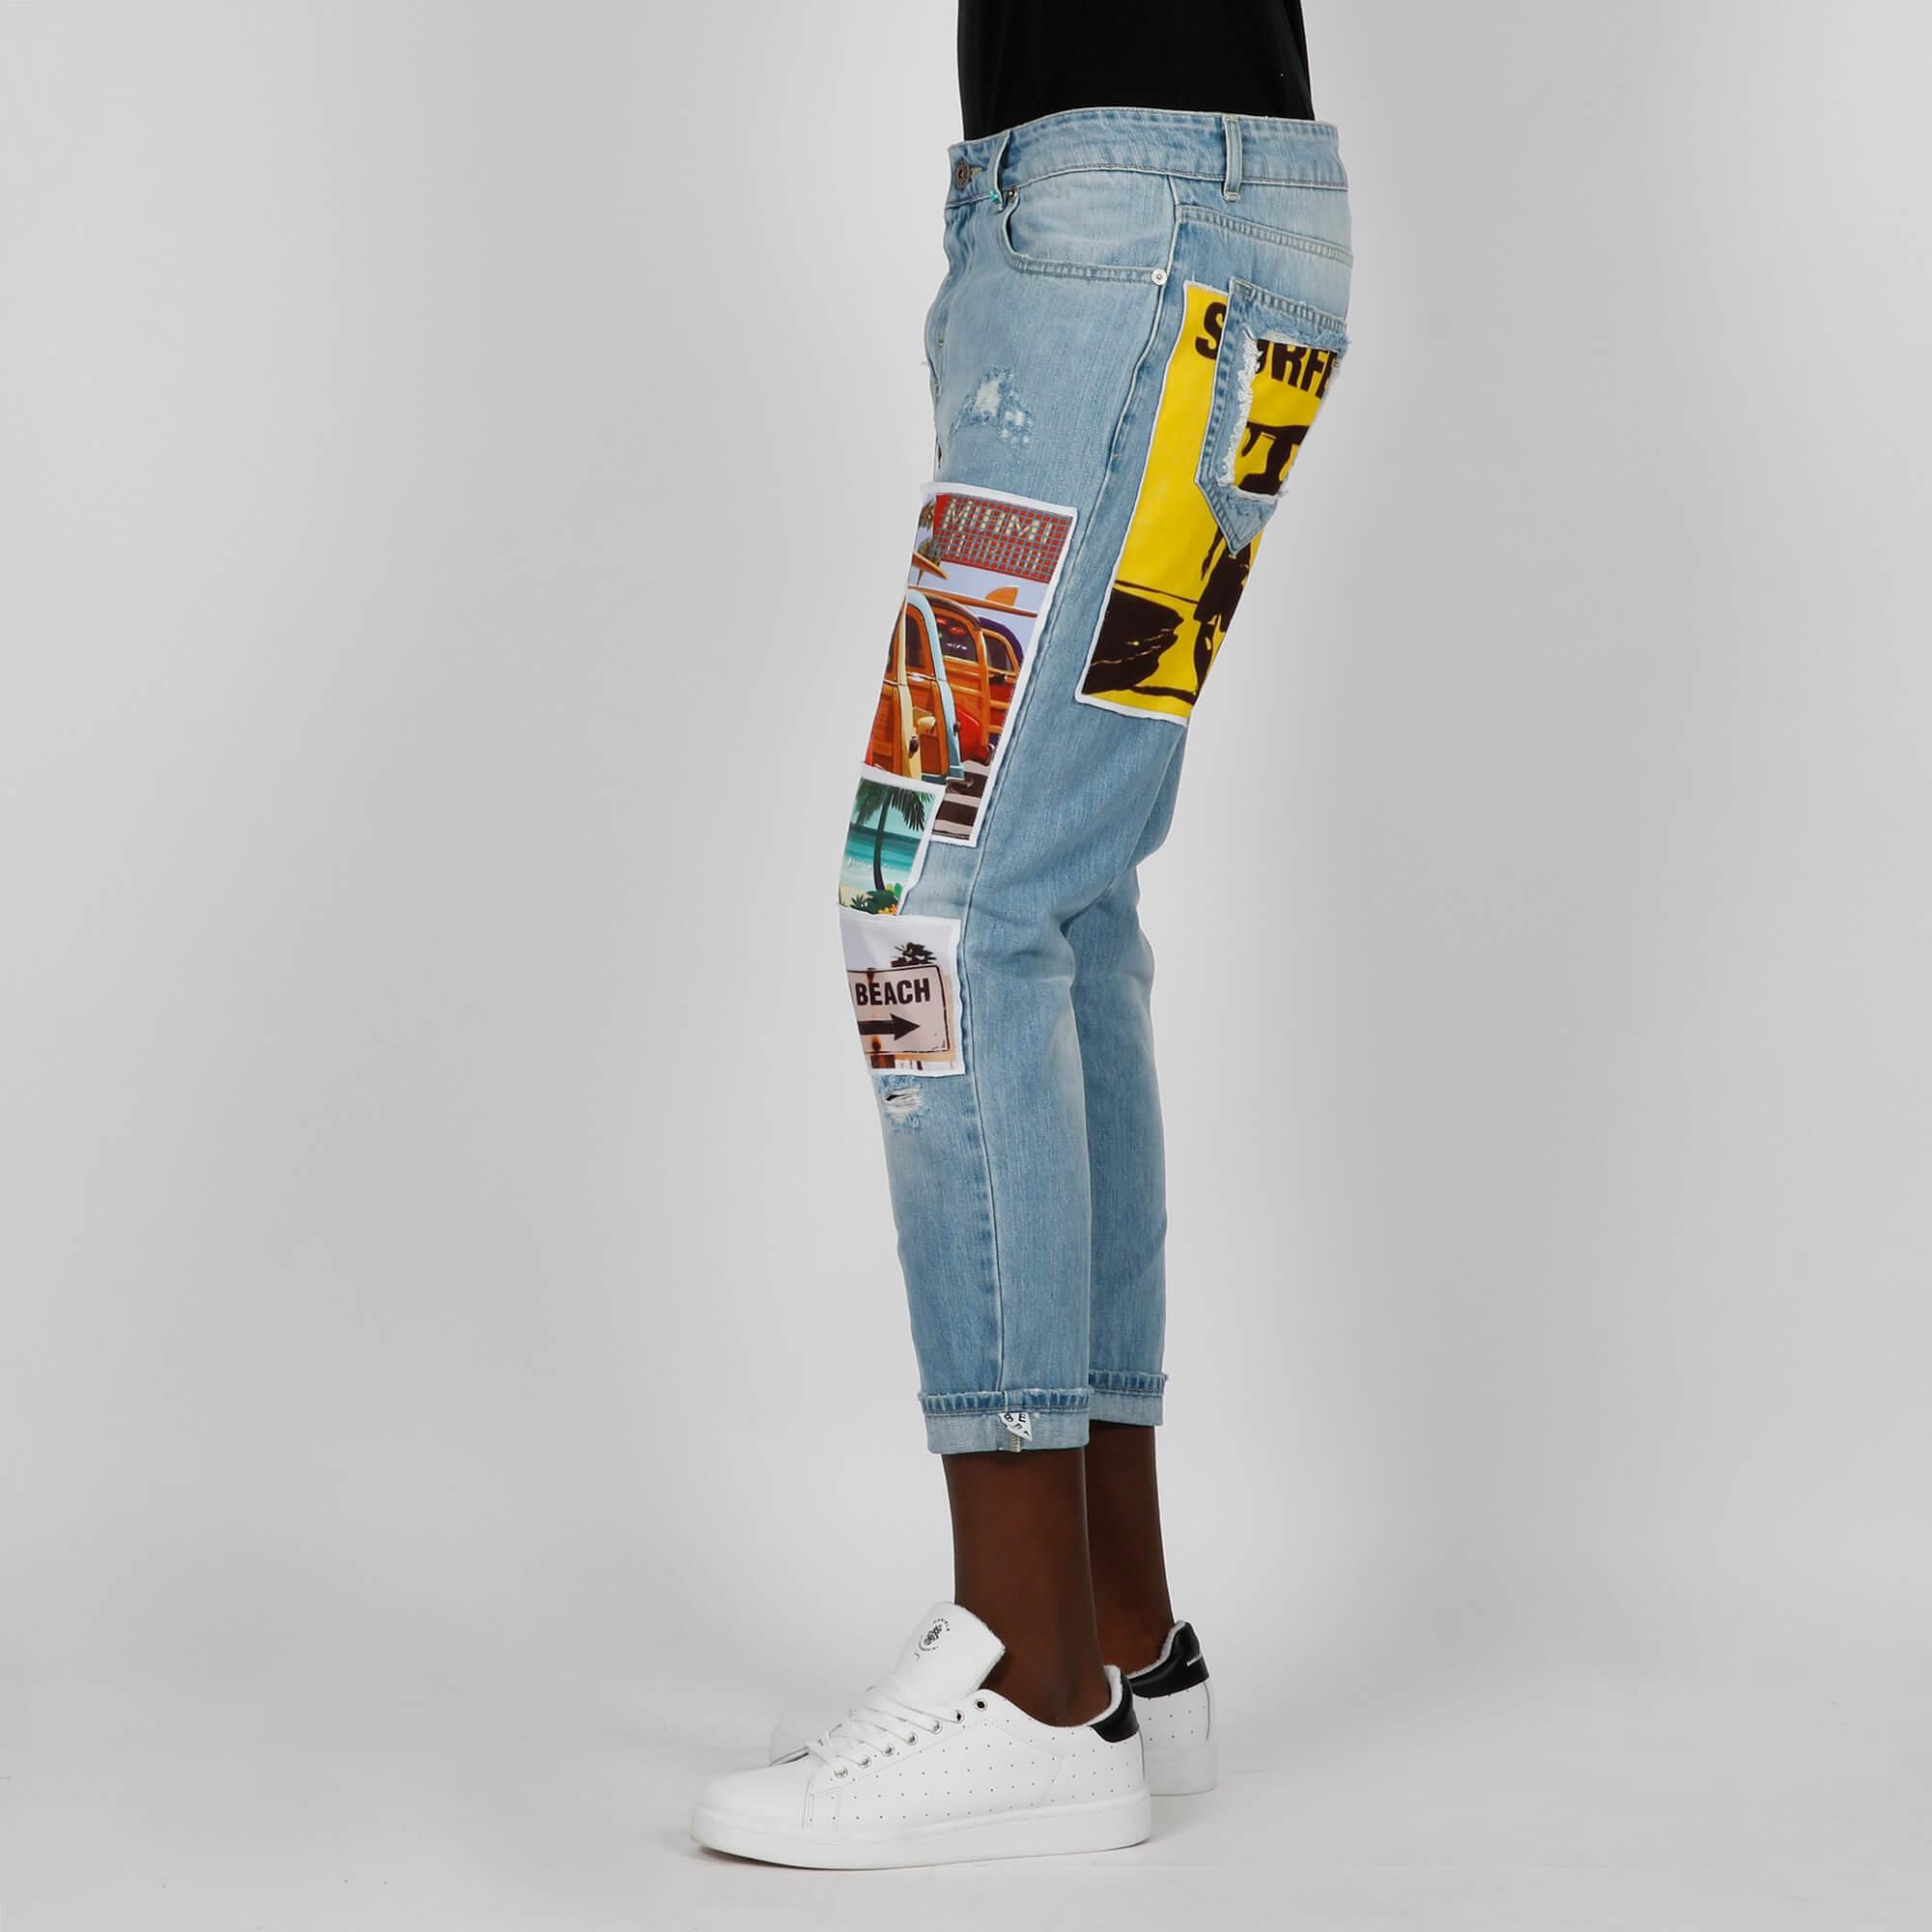 Jeans patch sea - Denim